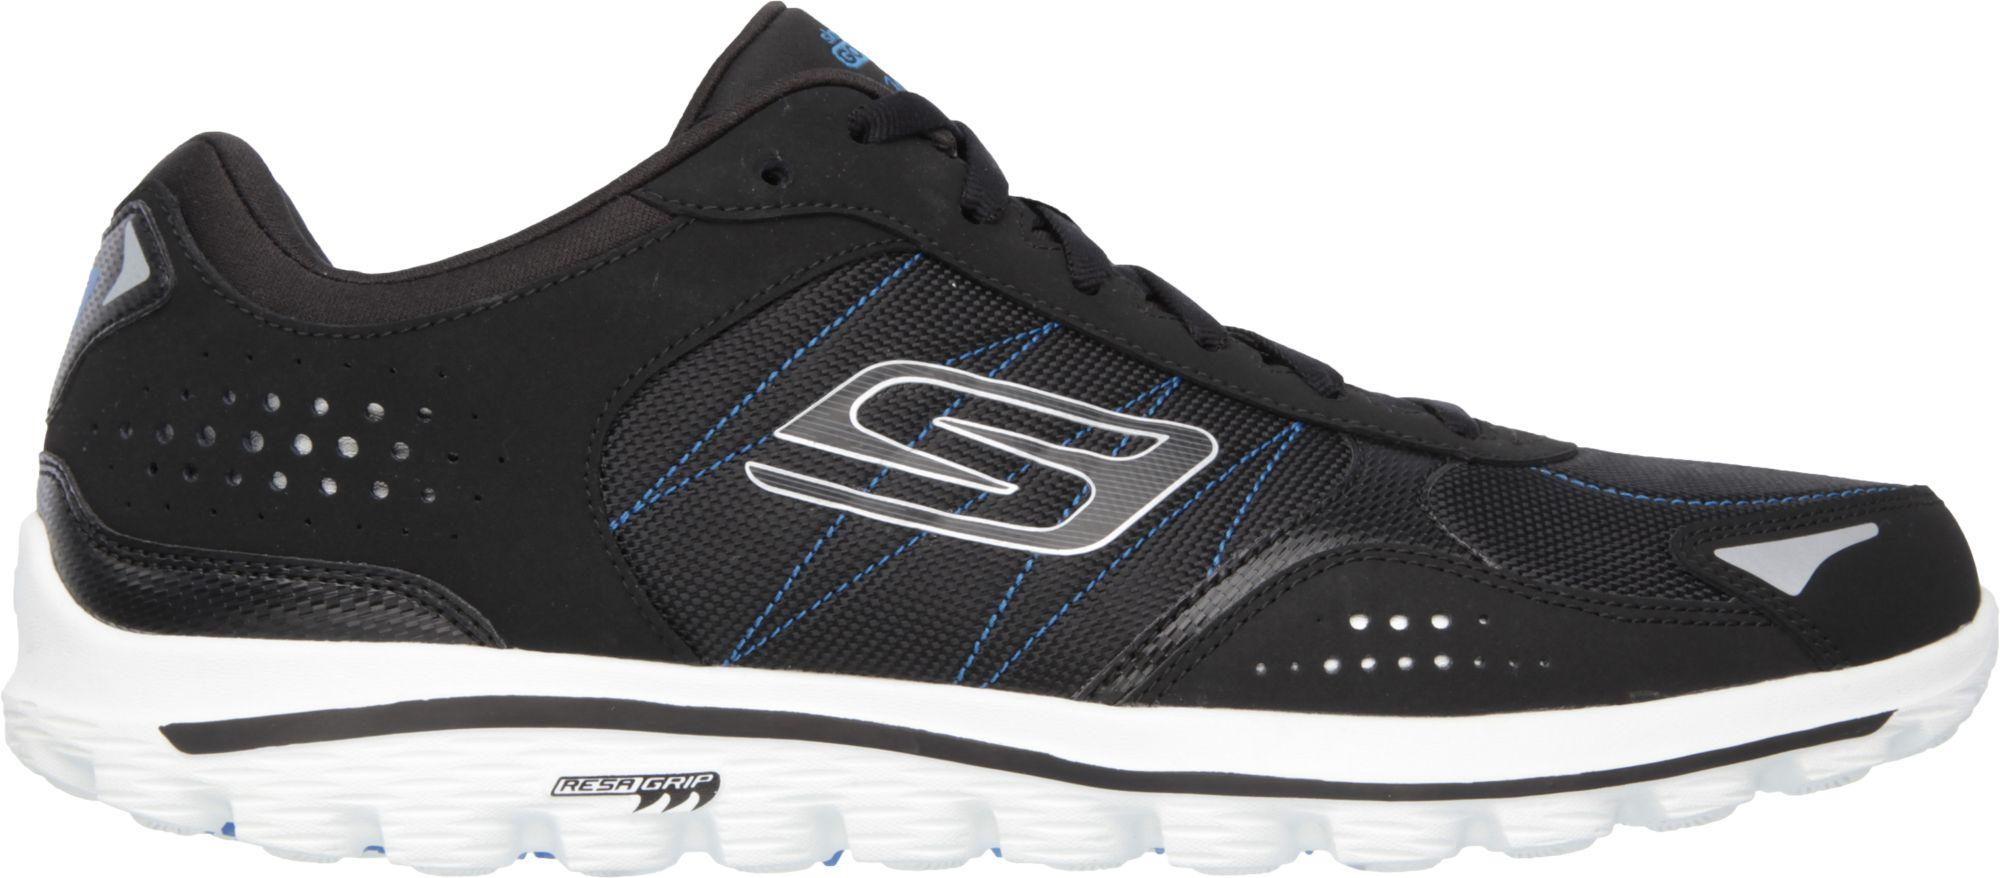 Skechers GOwalk 2 – Lynx Ballistic Golf Shoes